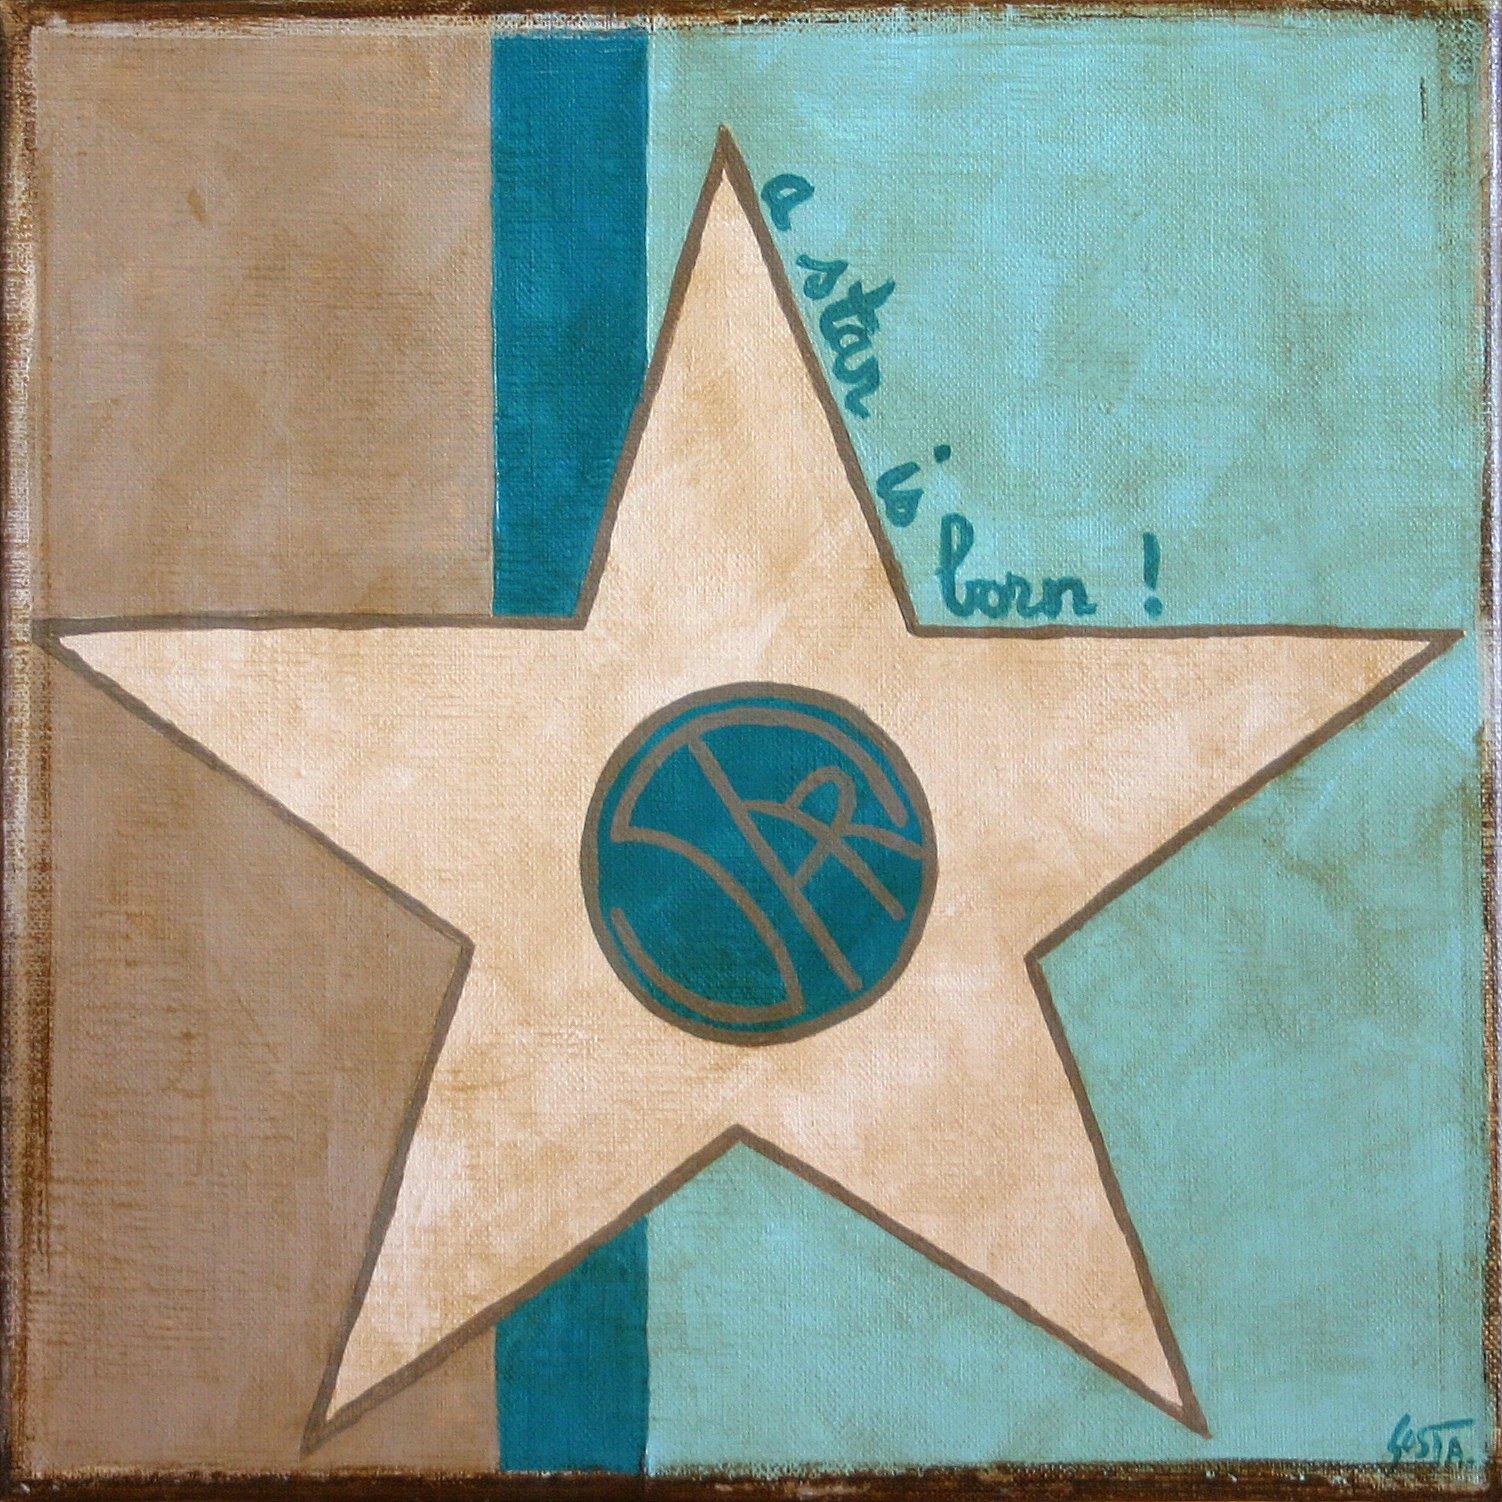 Tableau Contemporain, A star is born (5). Sophie Costa, artiste peintre.